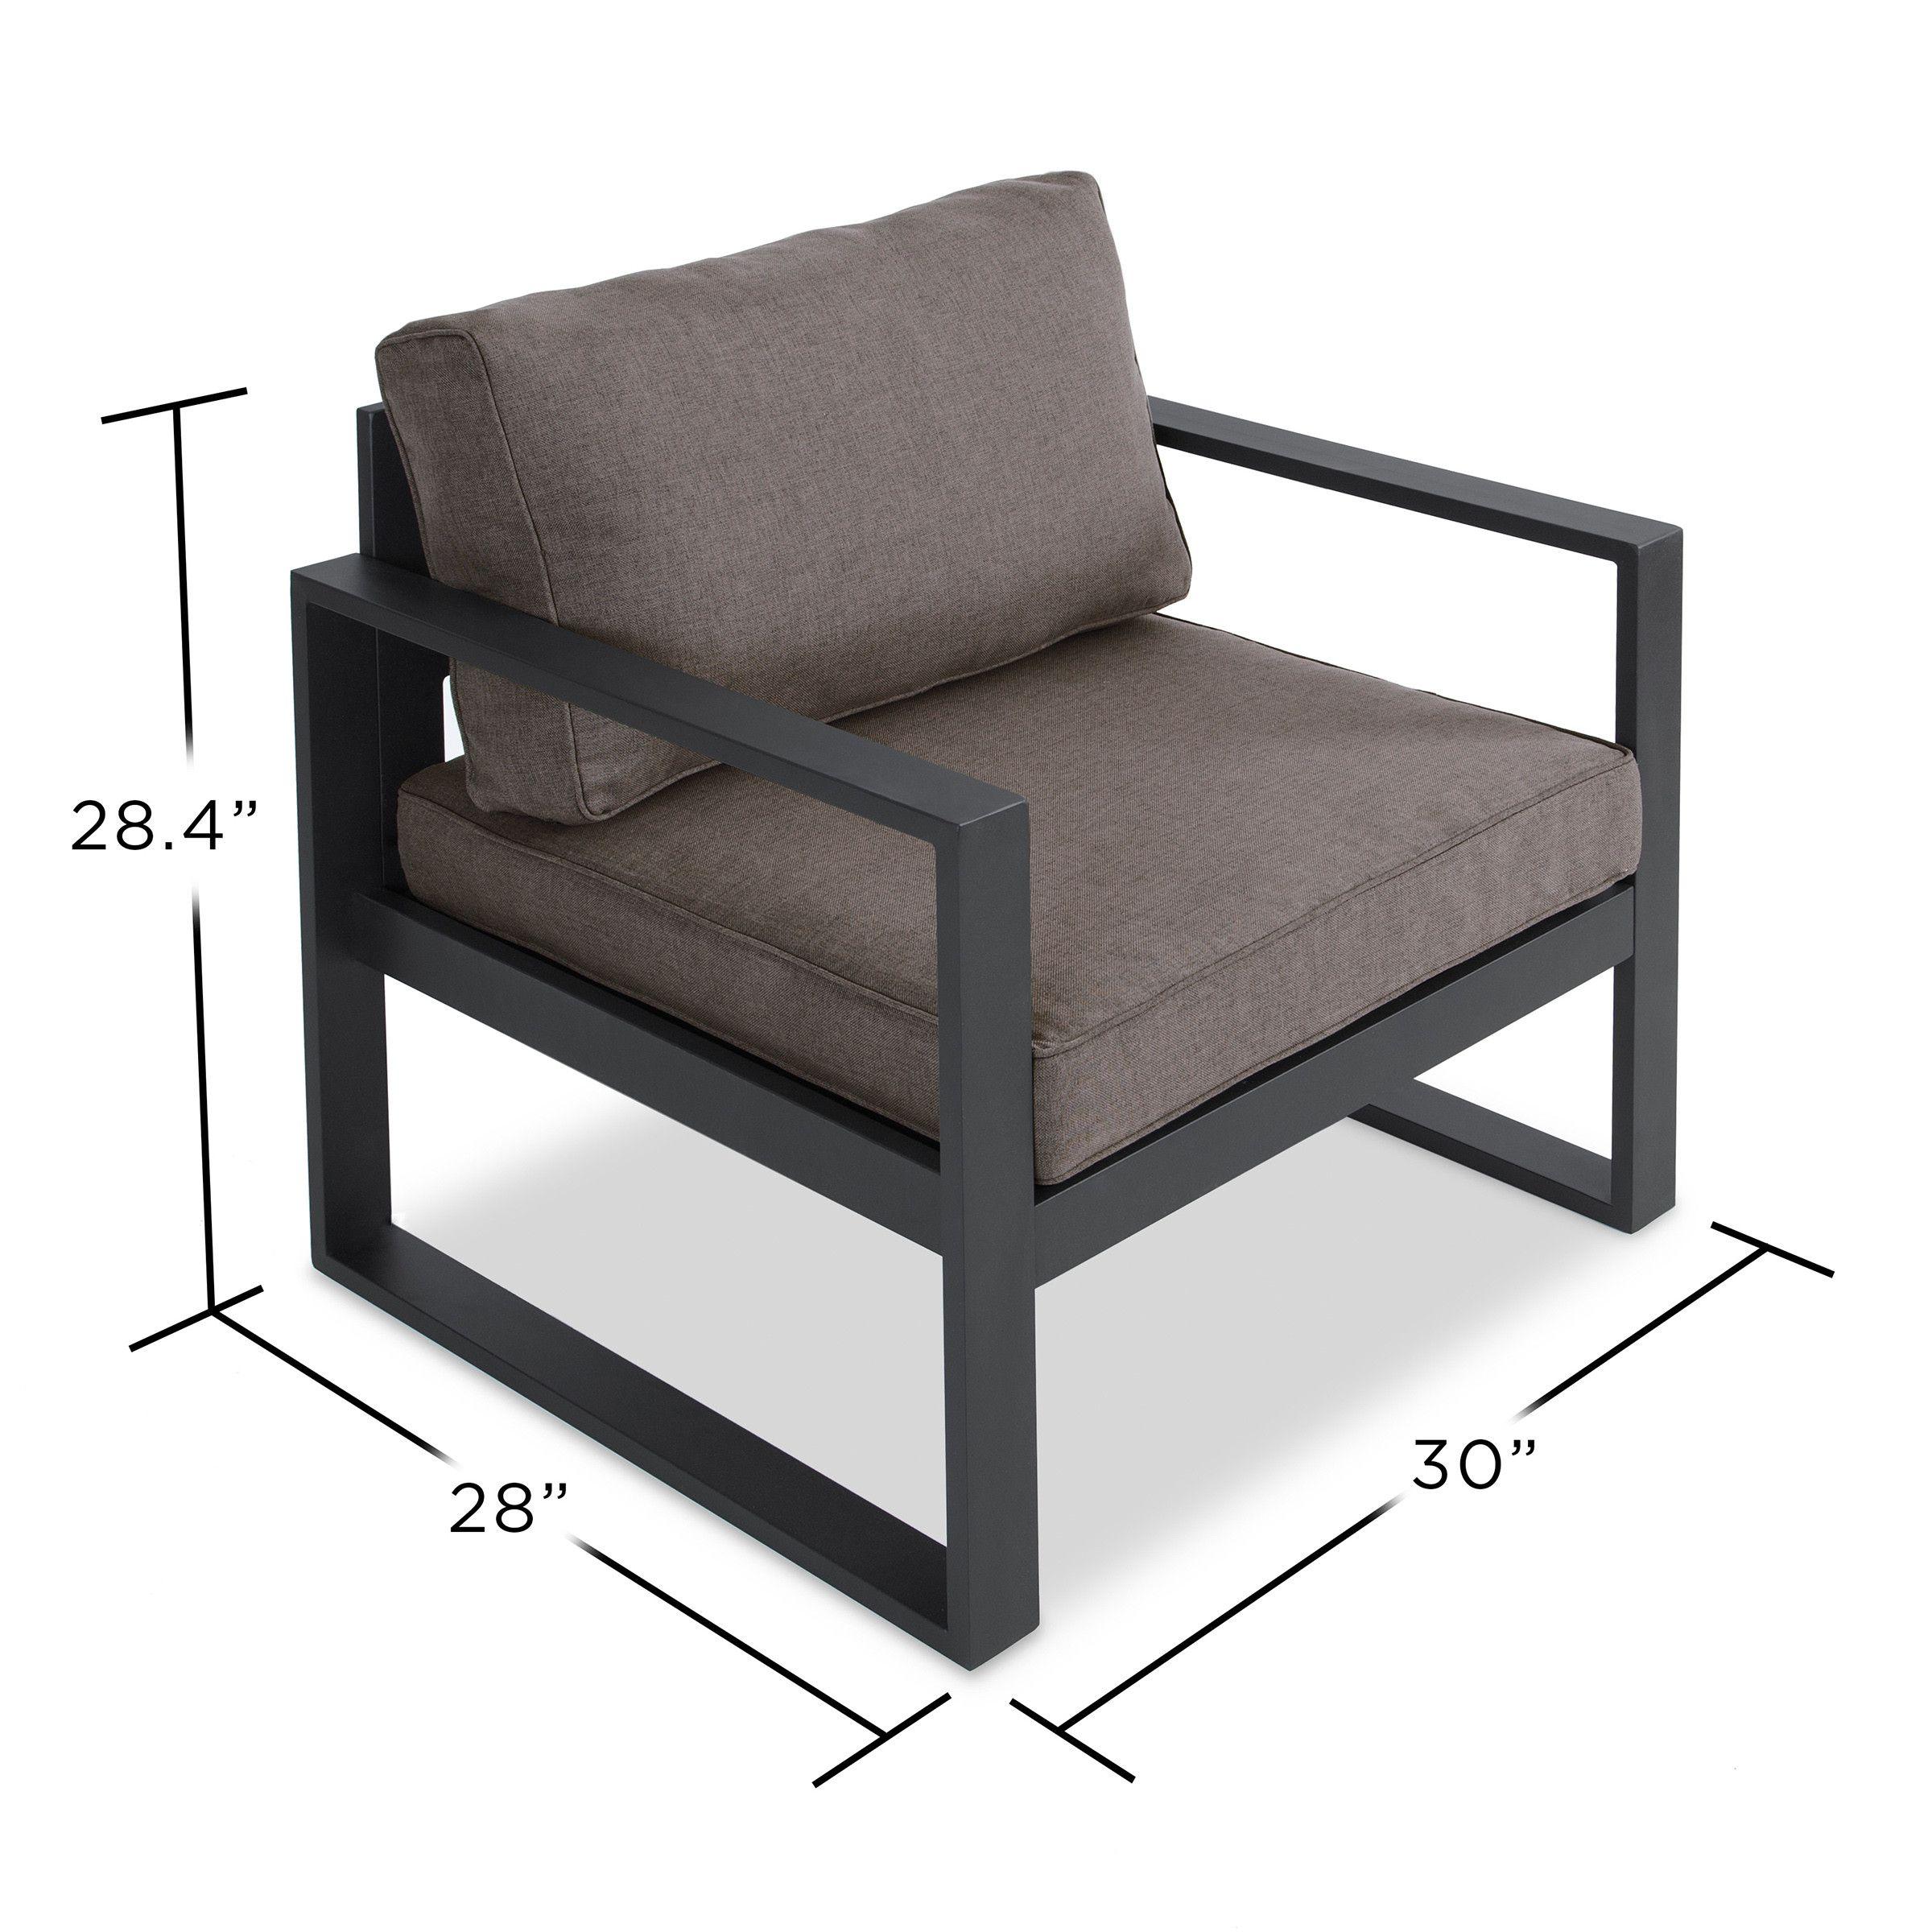 Baltic Patio Chair with Cushion in 2018   PORTAS ...